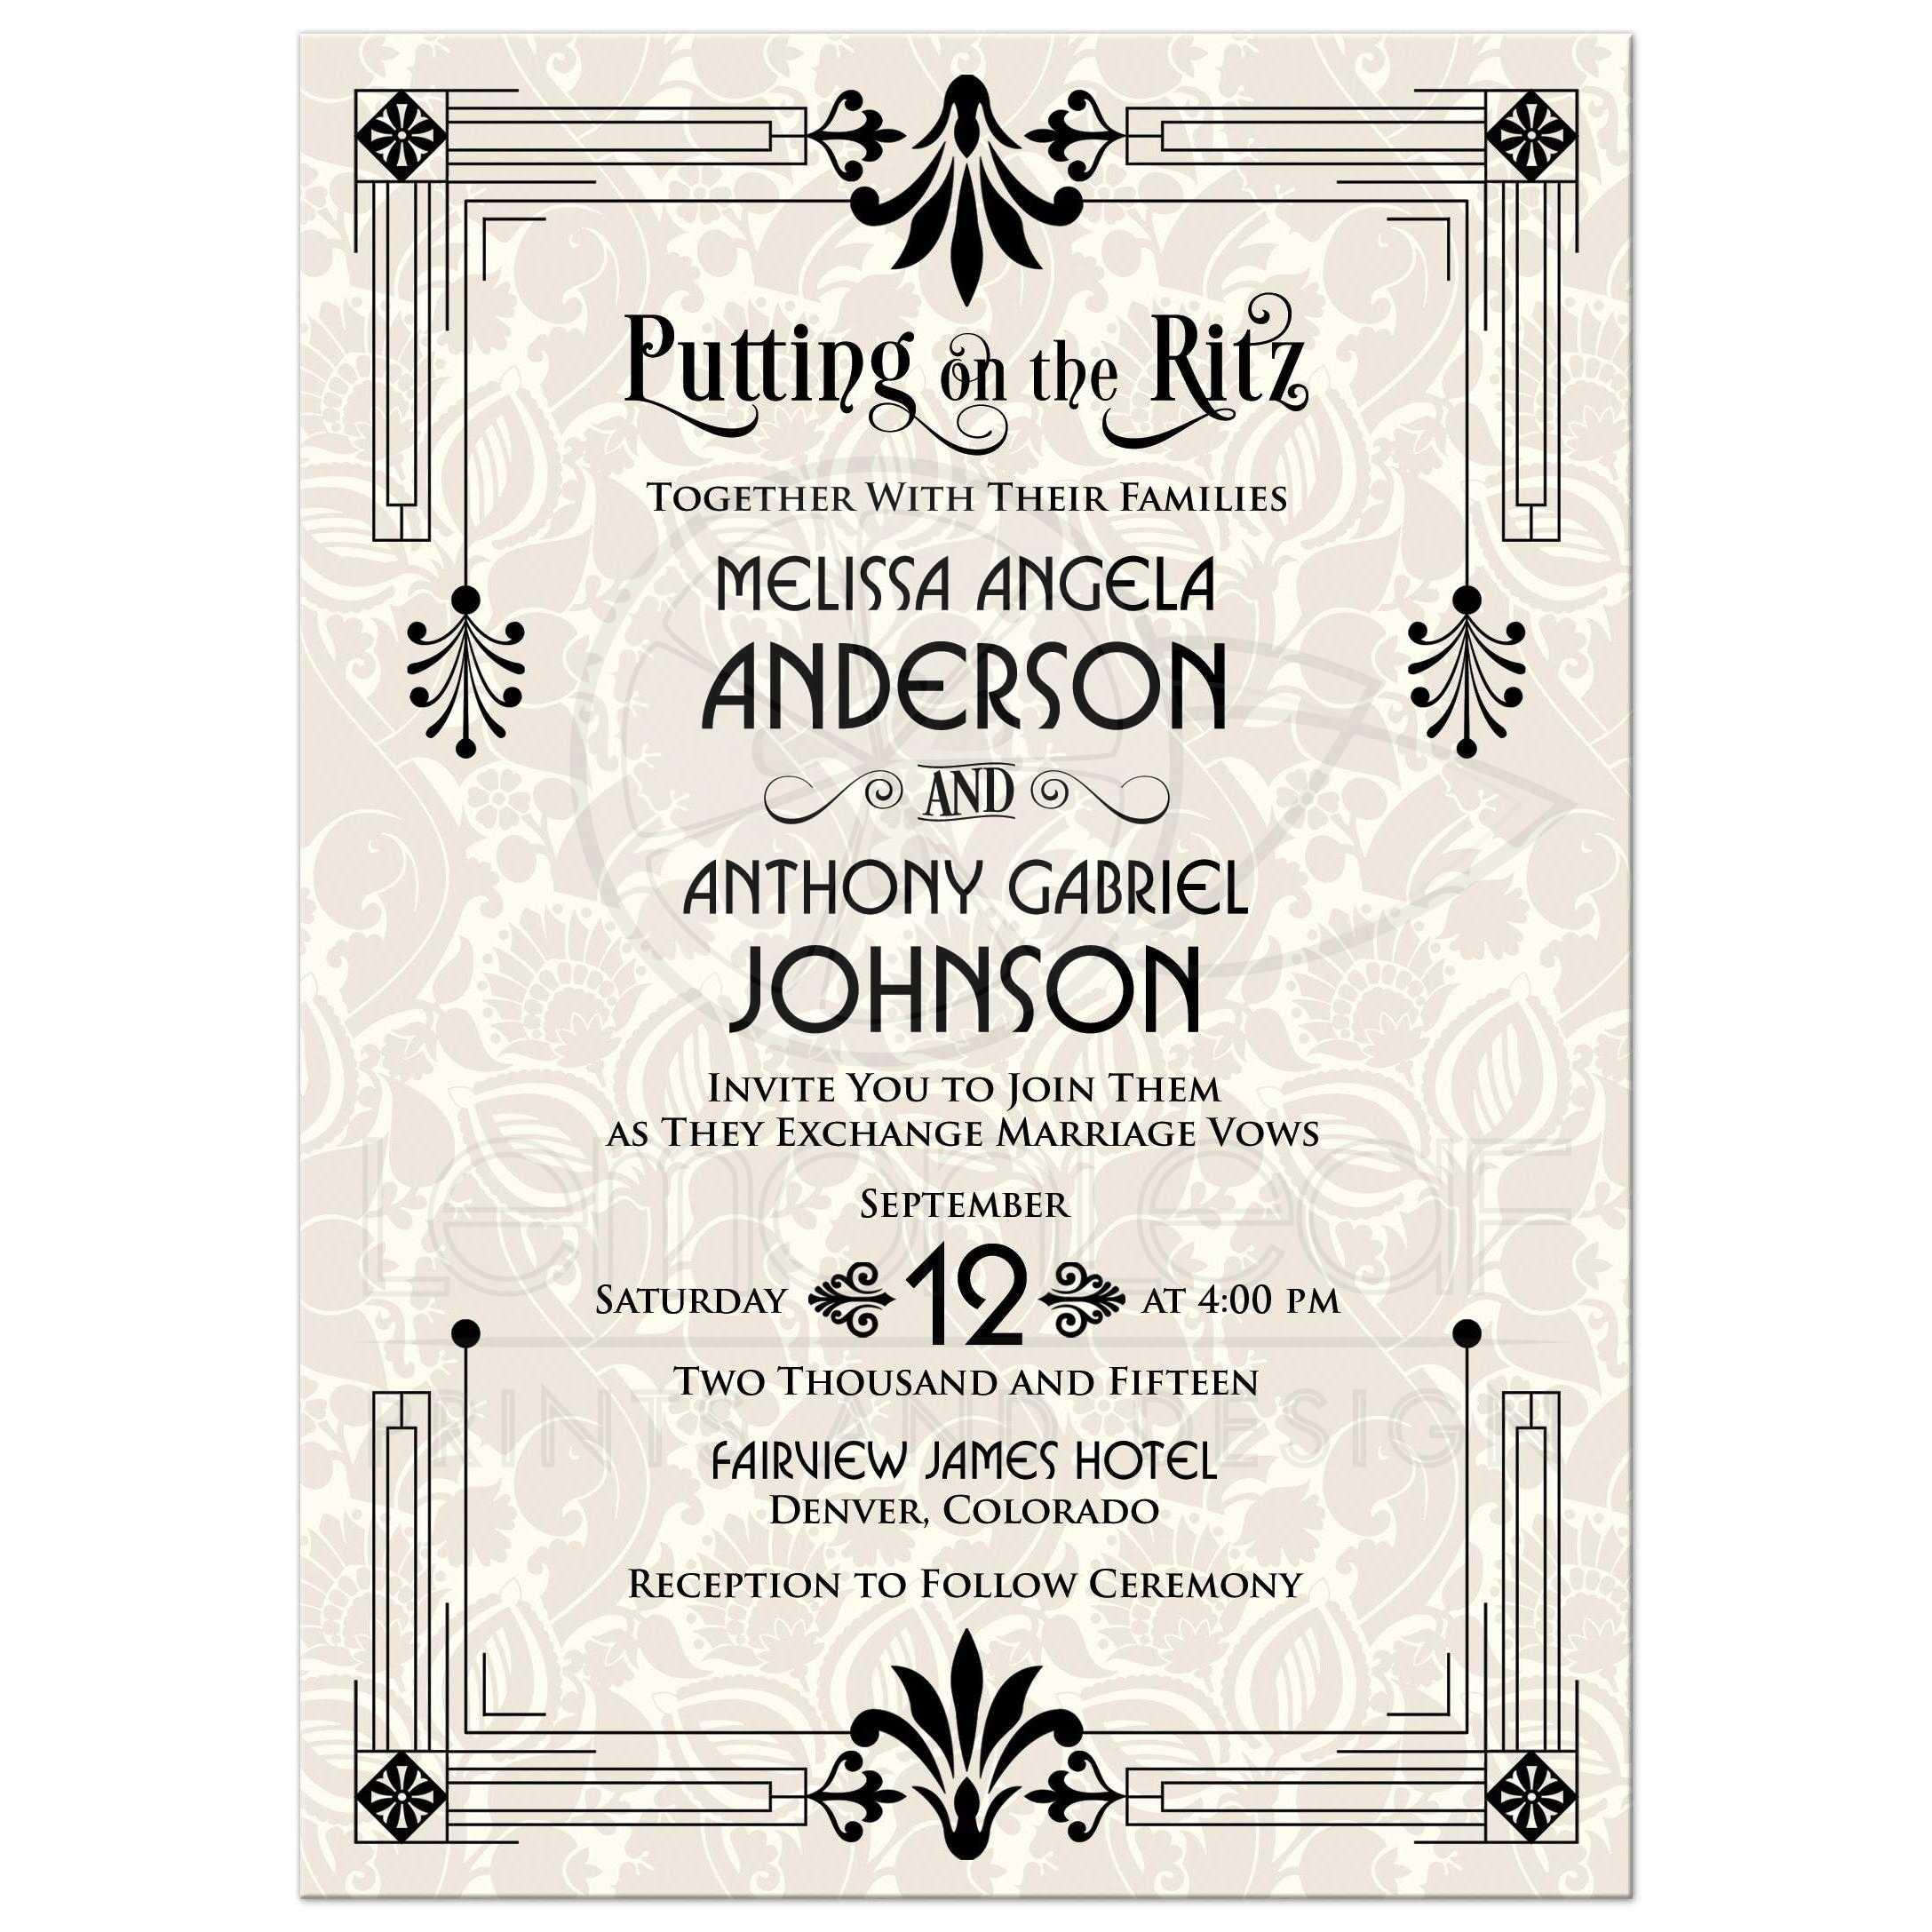 Wedding Invitation Roaring 20s Art Deco Black Ivory